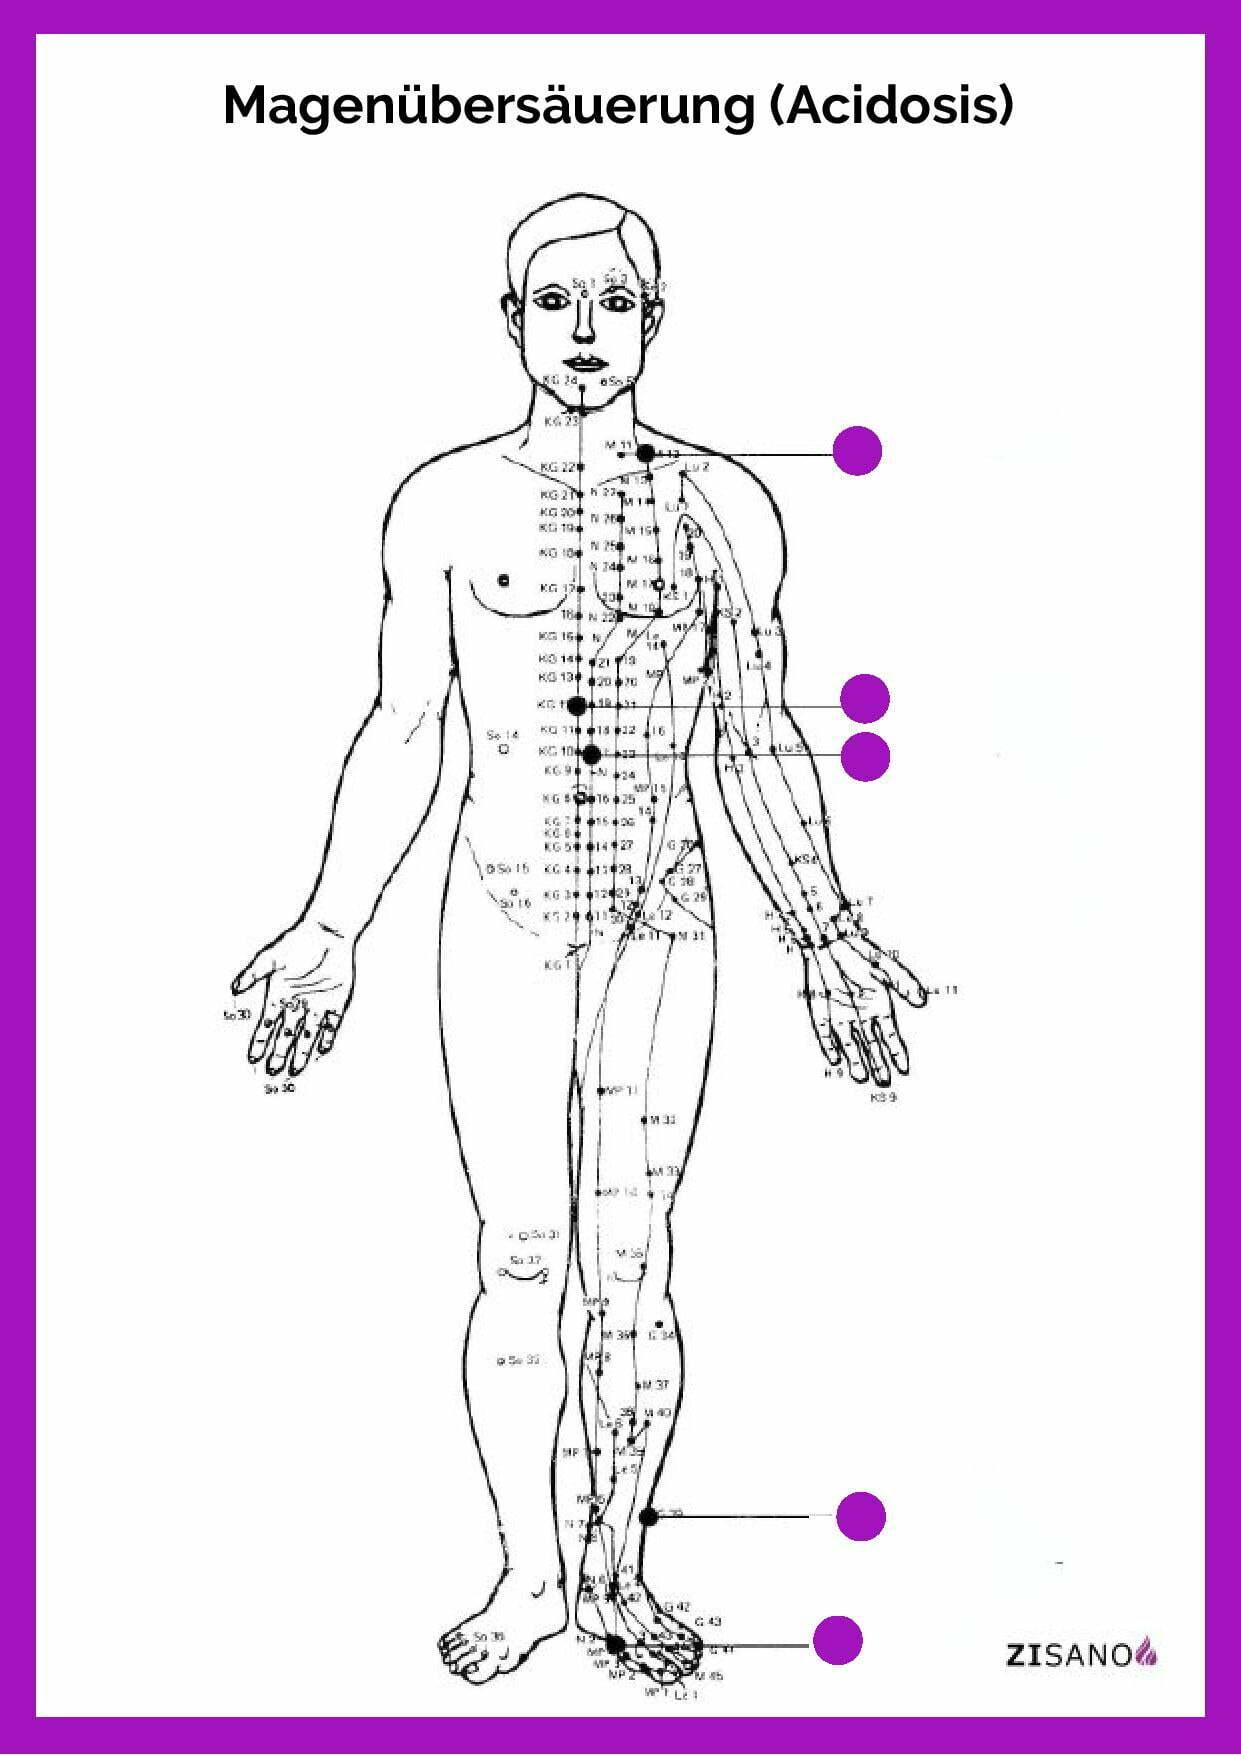 Meridiane - Magenübersäuerung - Acidosis - Beschwerden